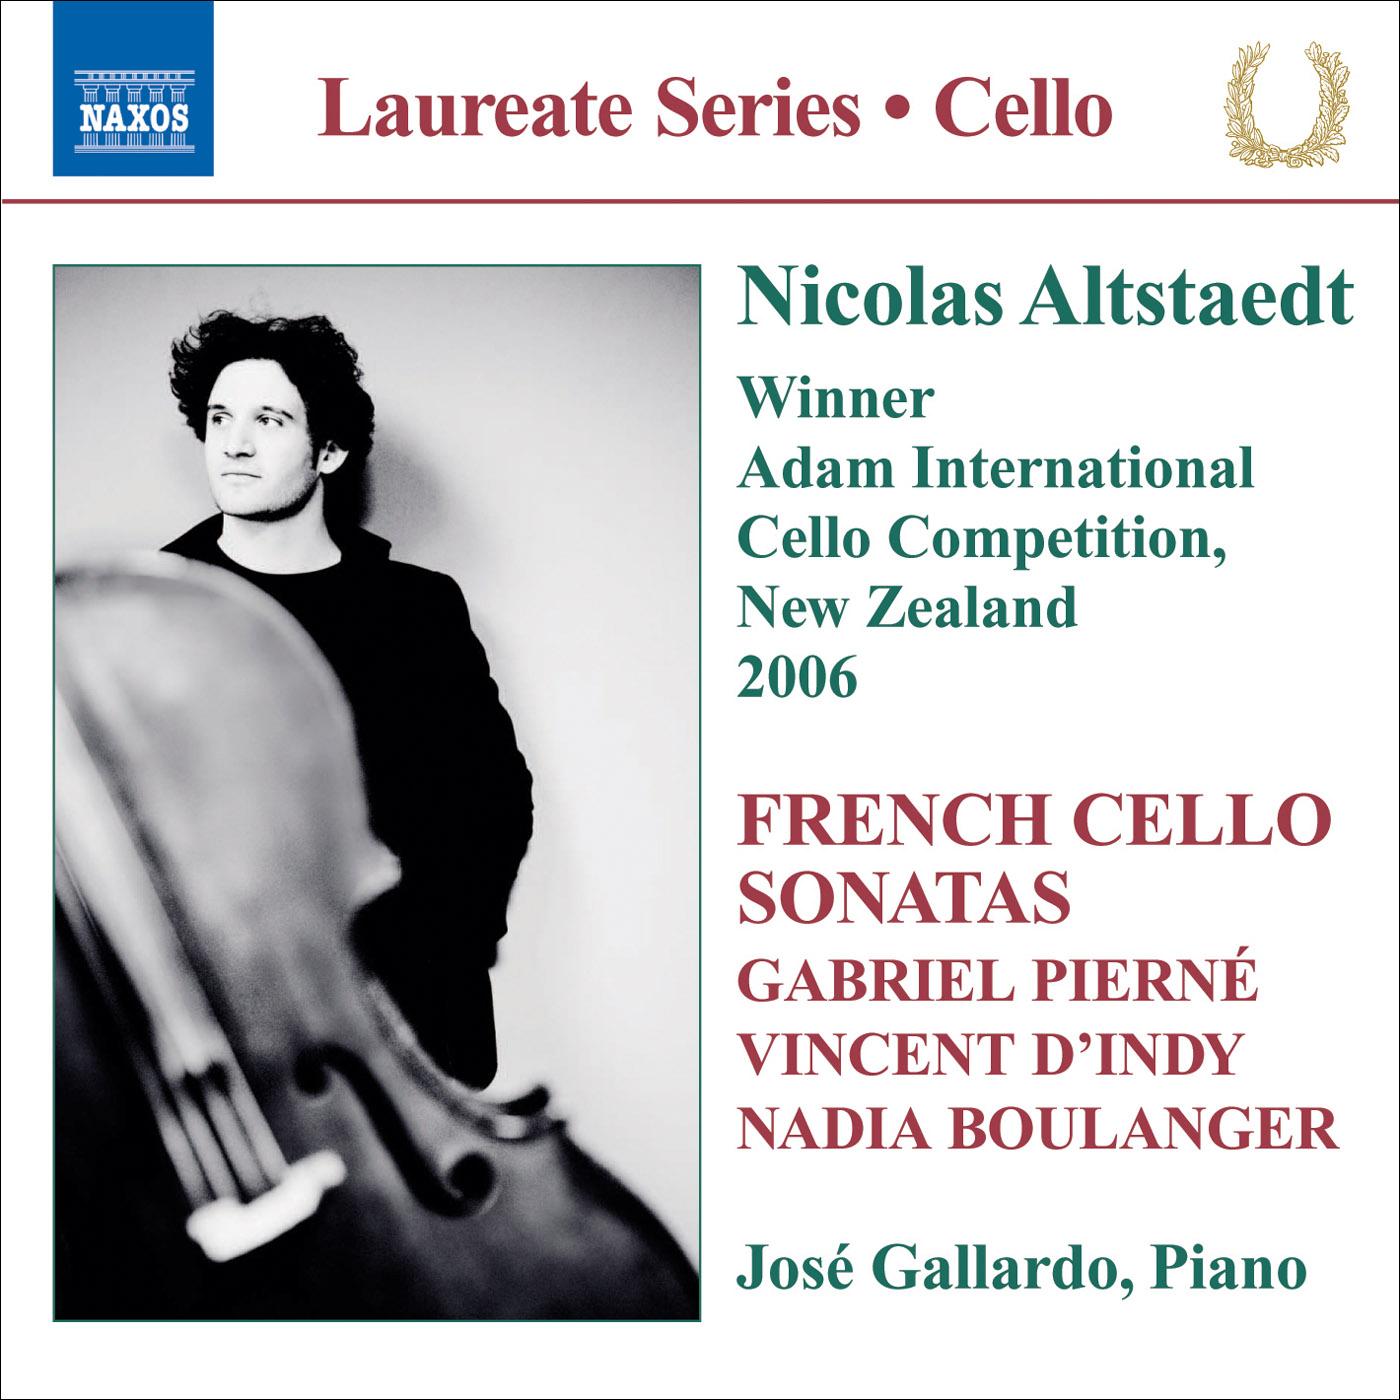 Altstaedt, Nicolas - French Cello Sonatas